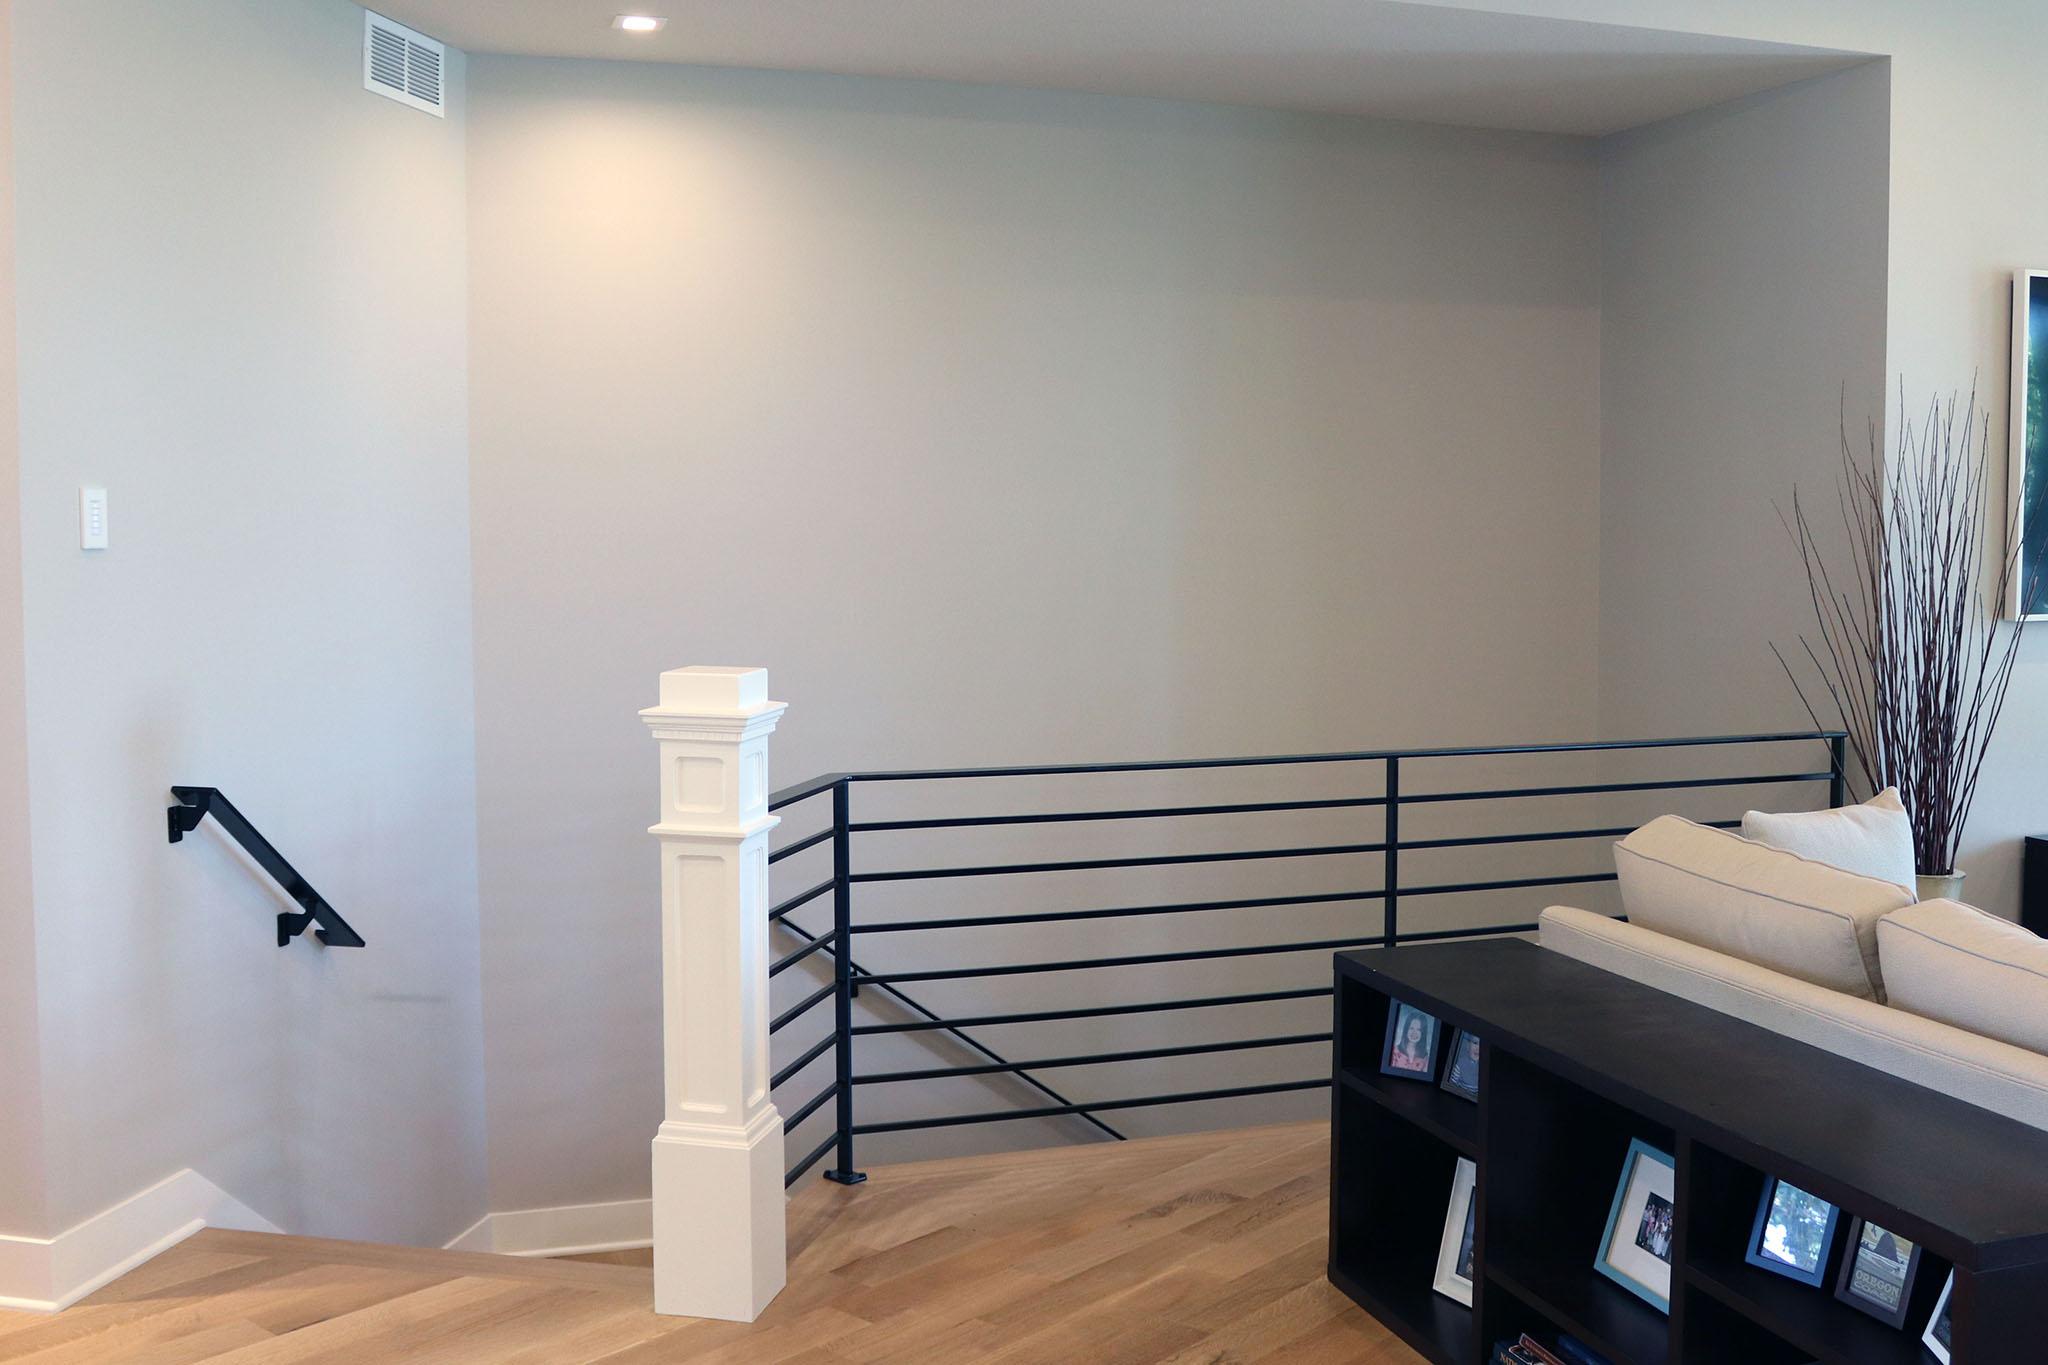 Modern horizontal black metal stair railing with bold painted wood newel post